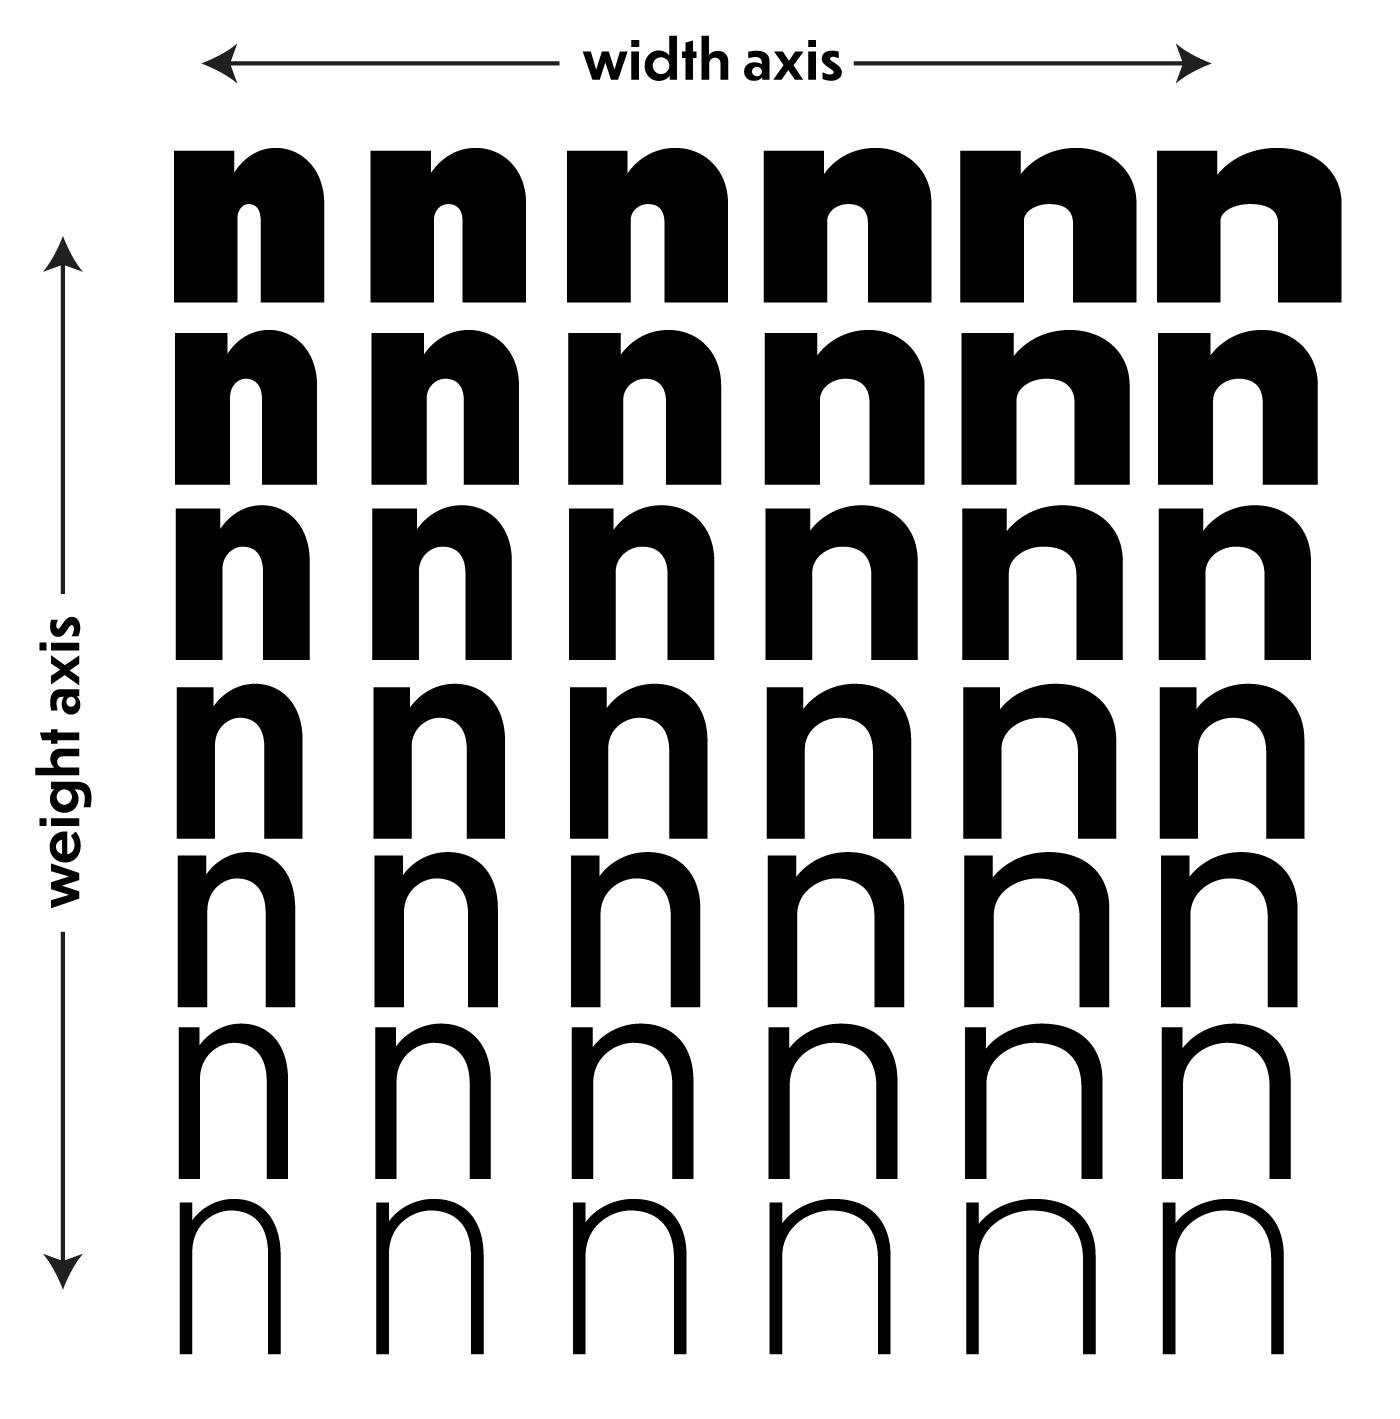 dunbar_variable_fonts_weight_width_axes